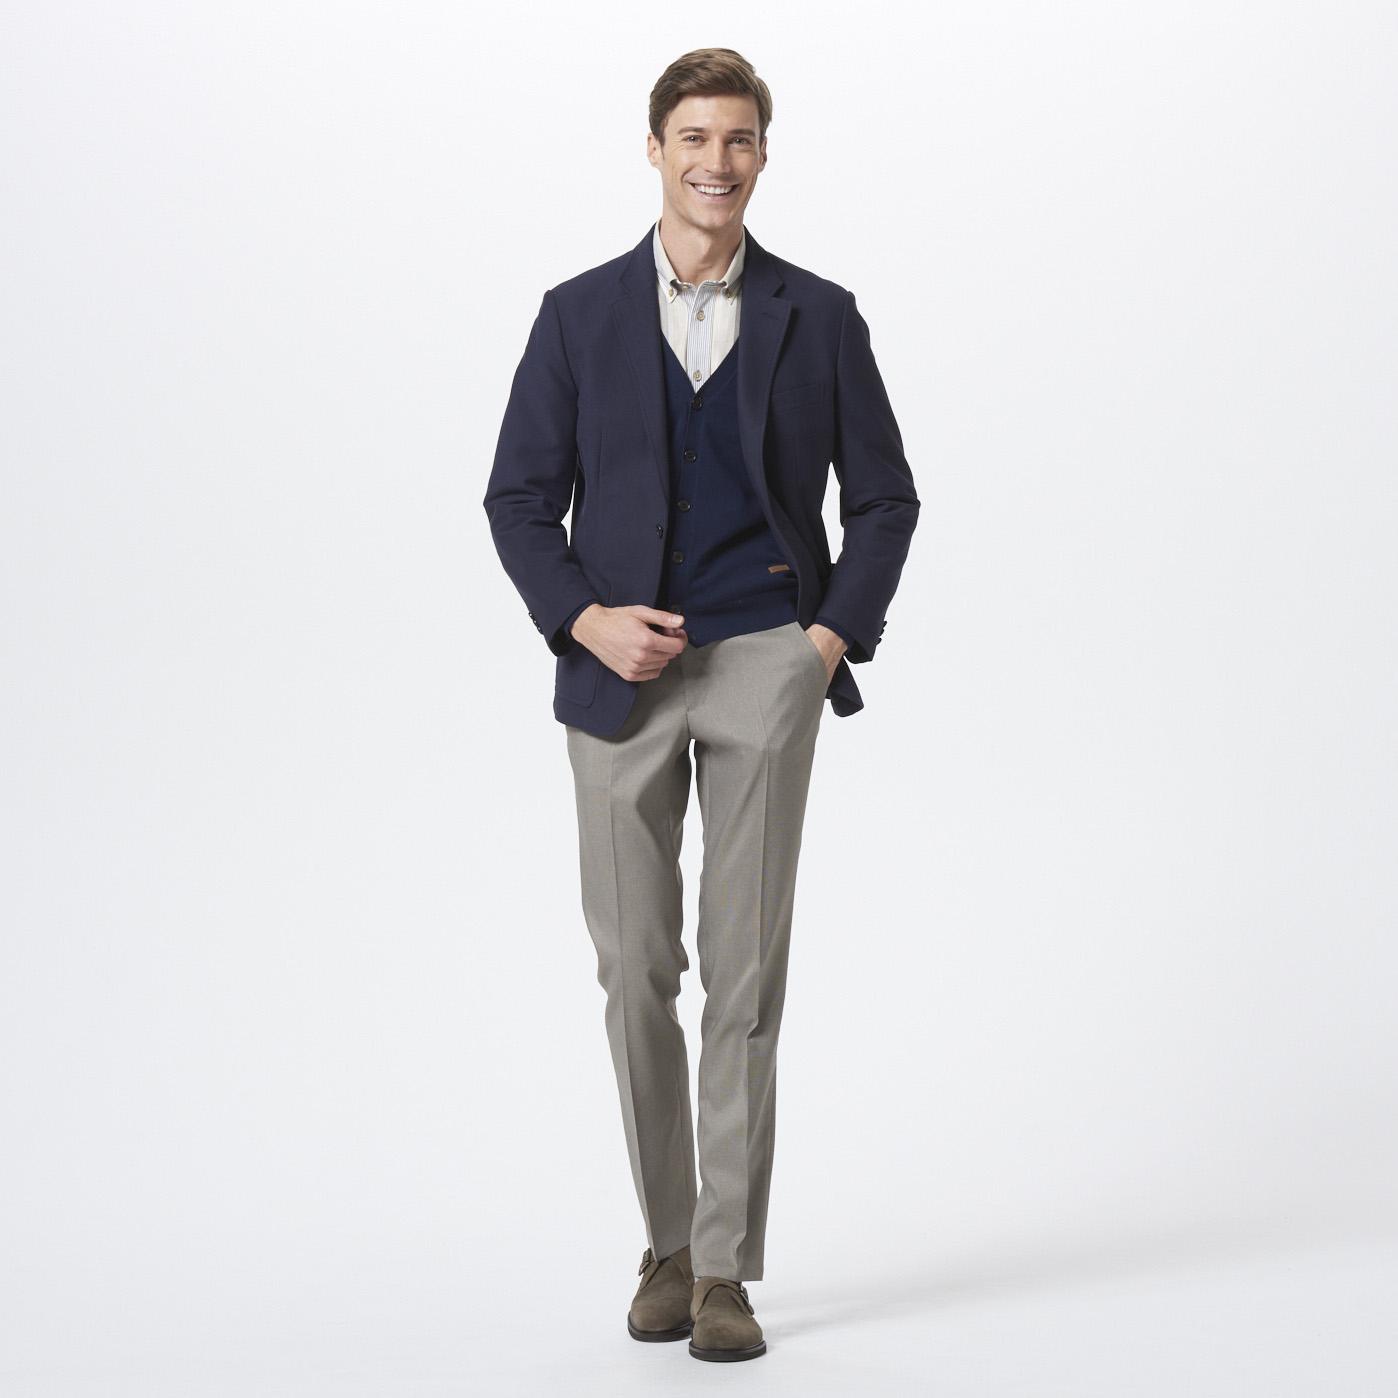 【GoldenBear Mens】<br />春のジャケット着回し提案